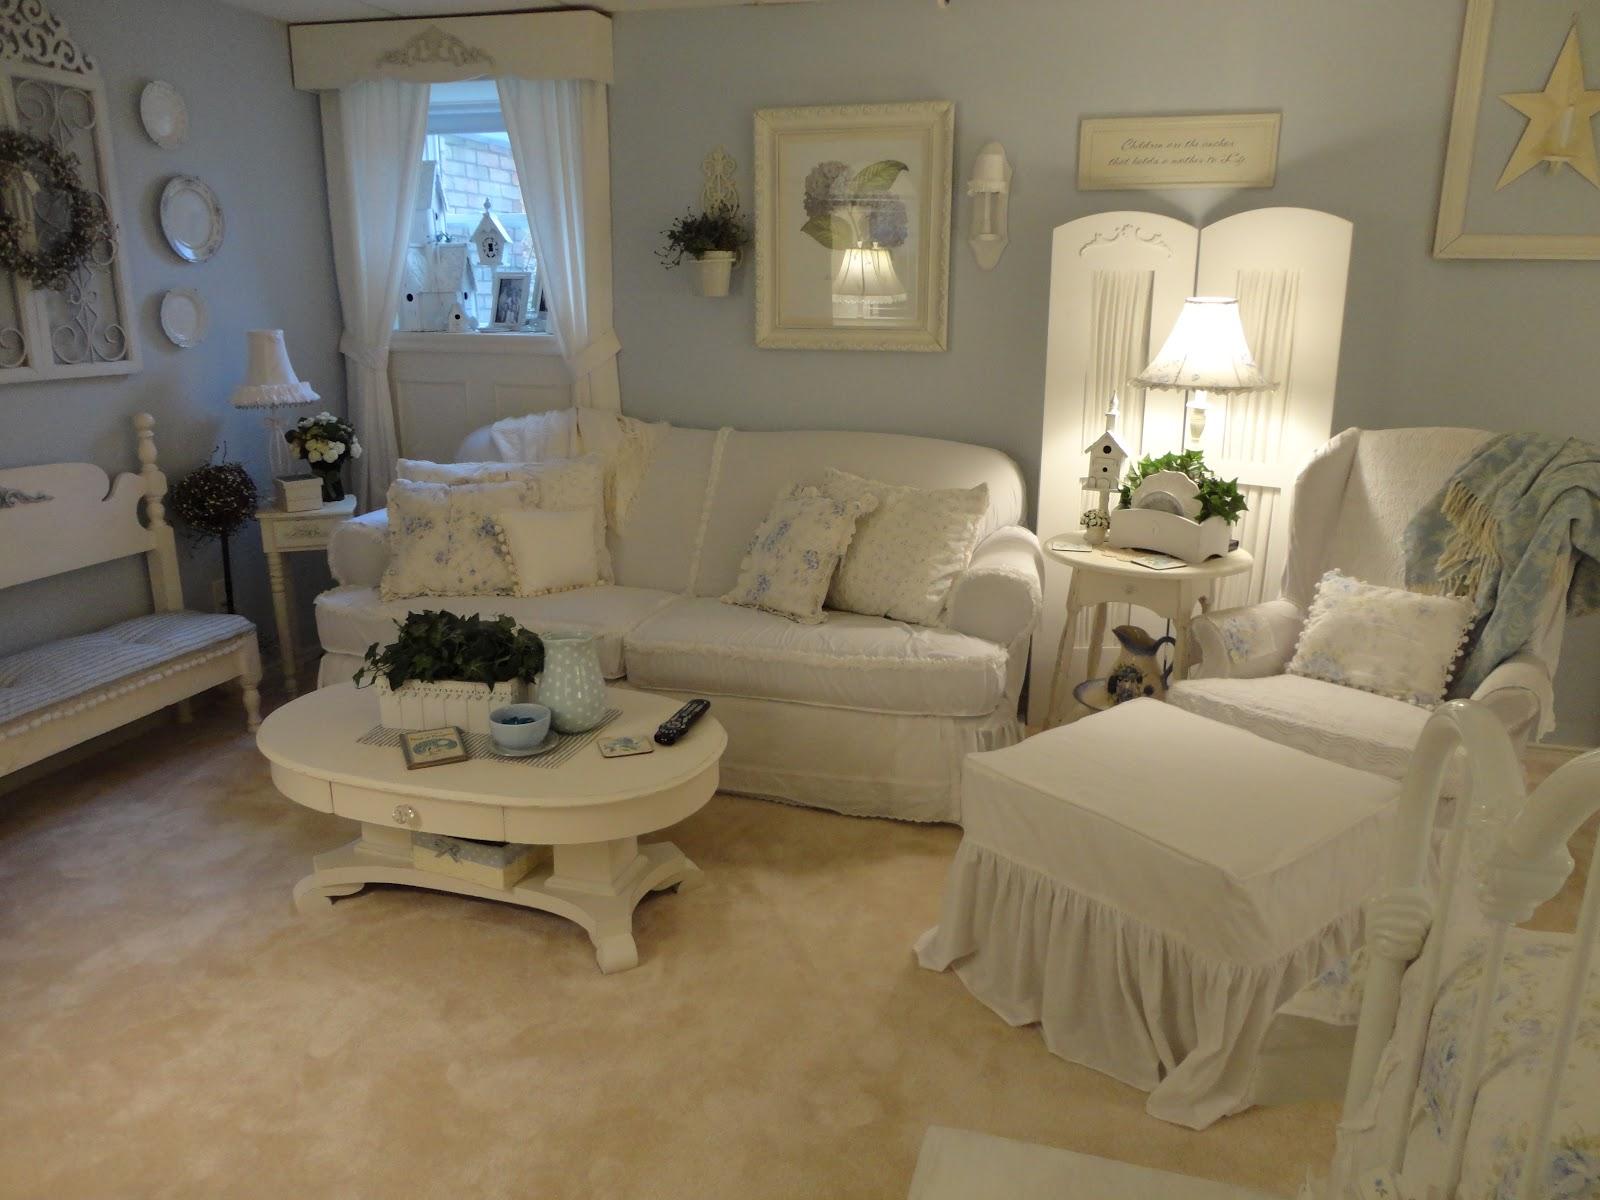 shabby chic home decor home tour debbiedoo 39 s. Black Bedroom Furniture Sets. Home Design Ideas